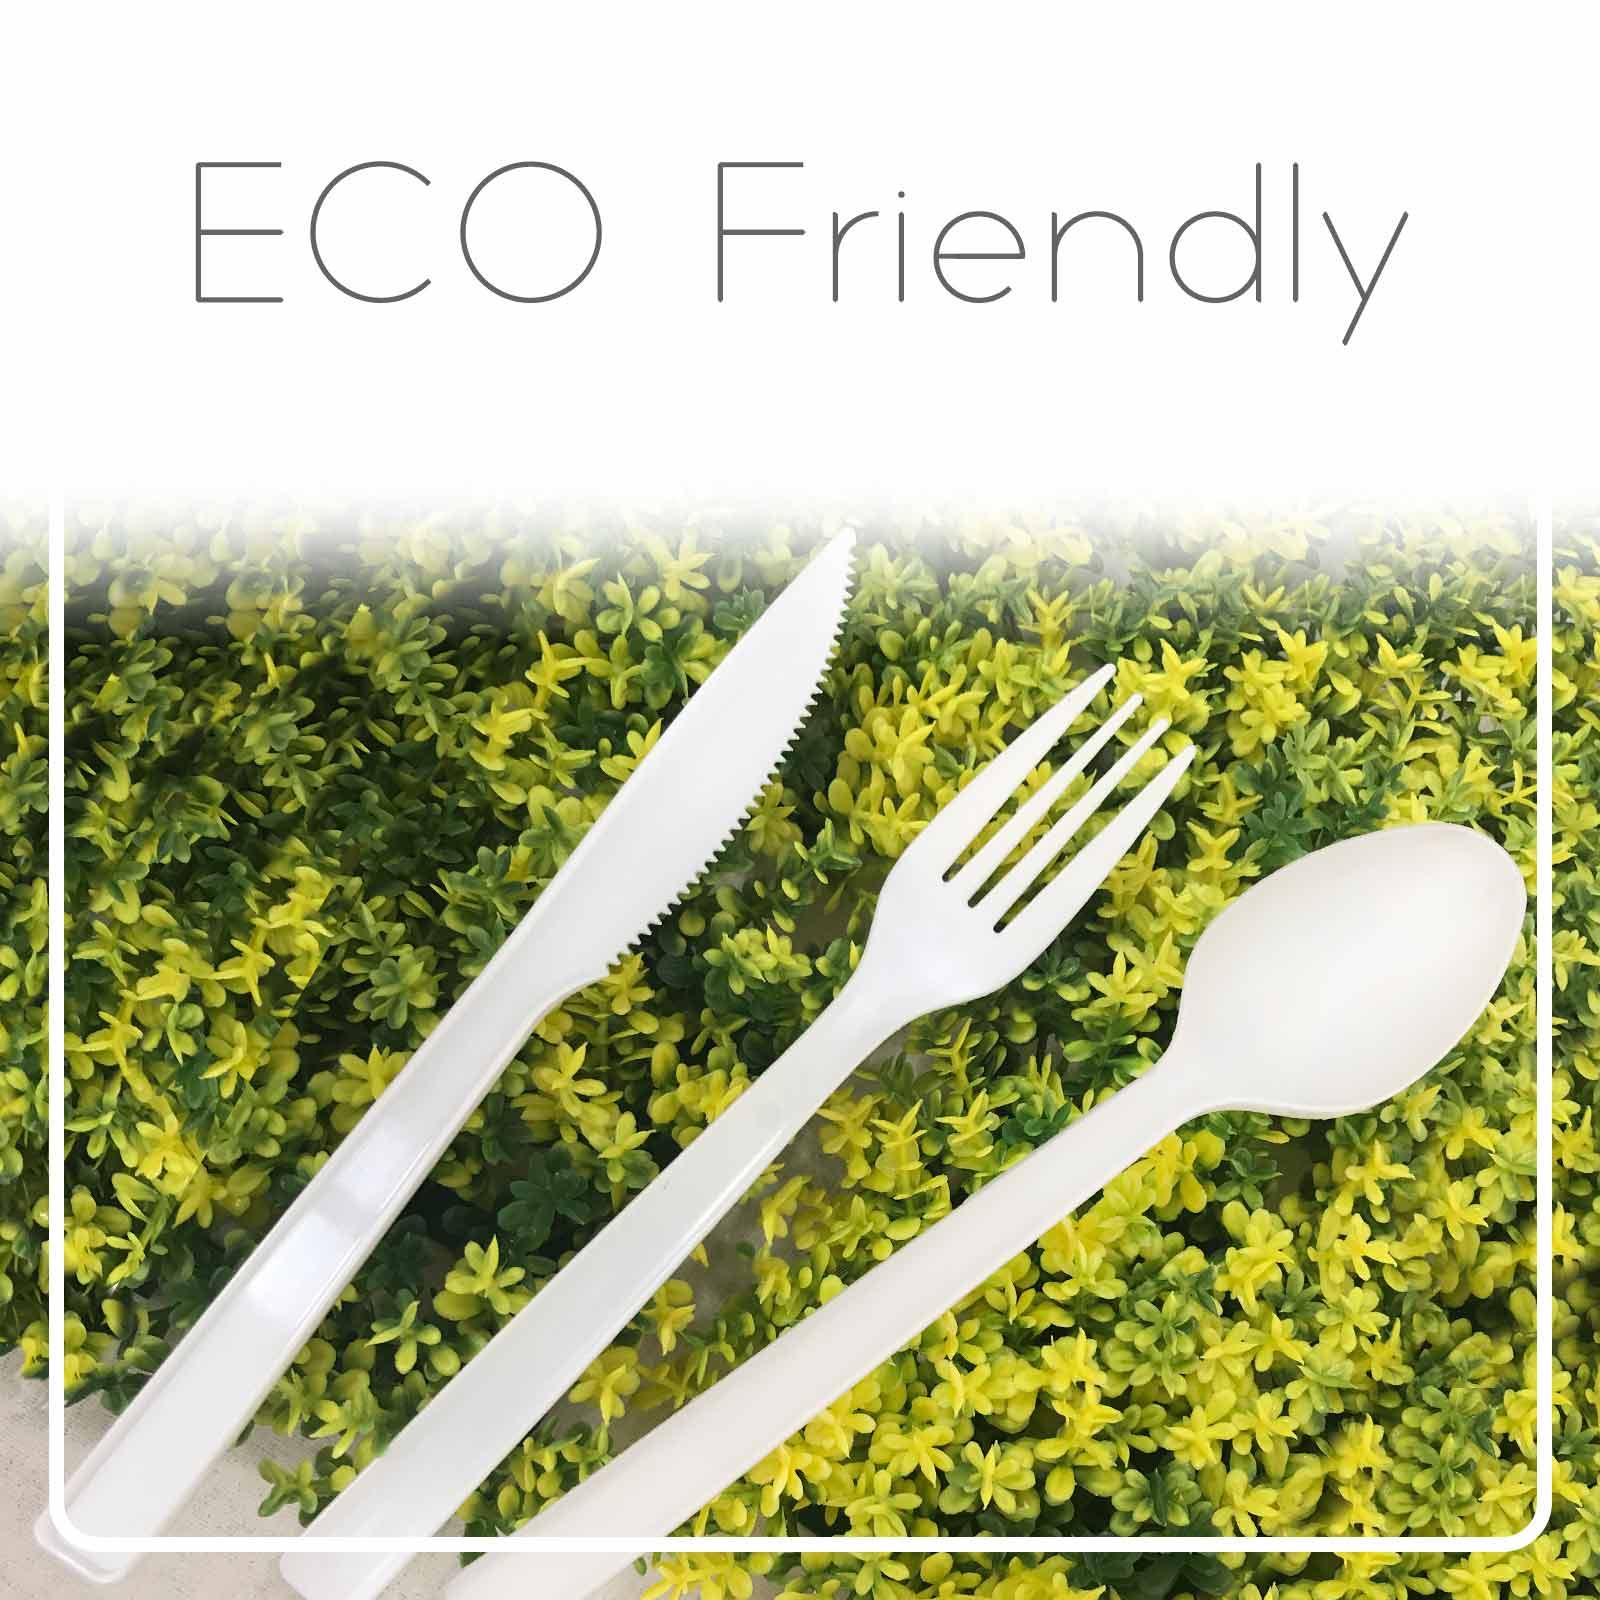 Eco Friendly Tableware - Peralatan sekali pakai yang mesra alam